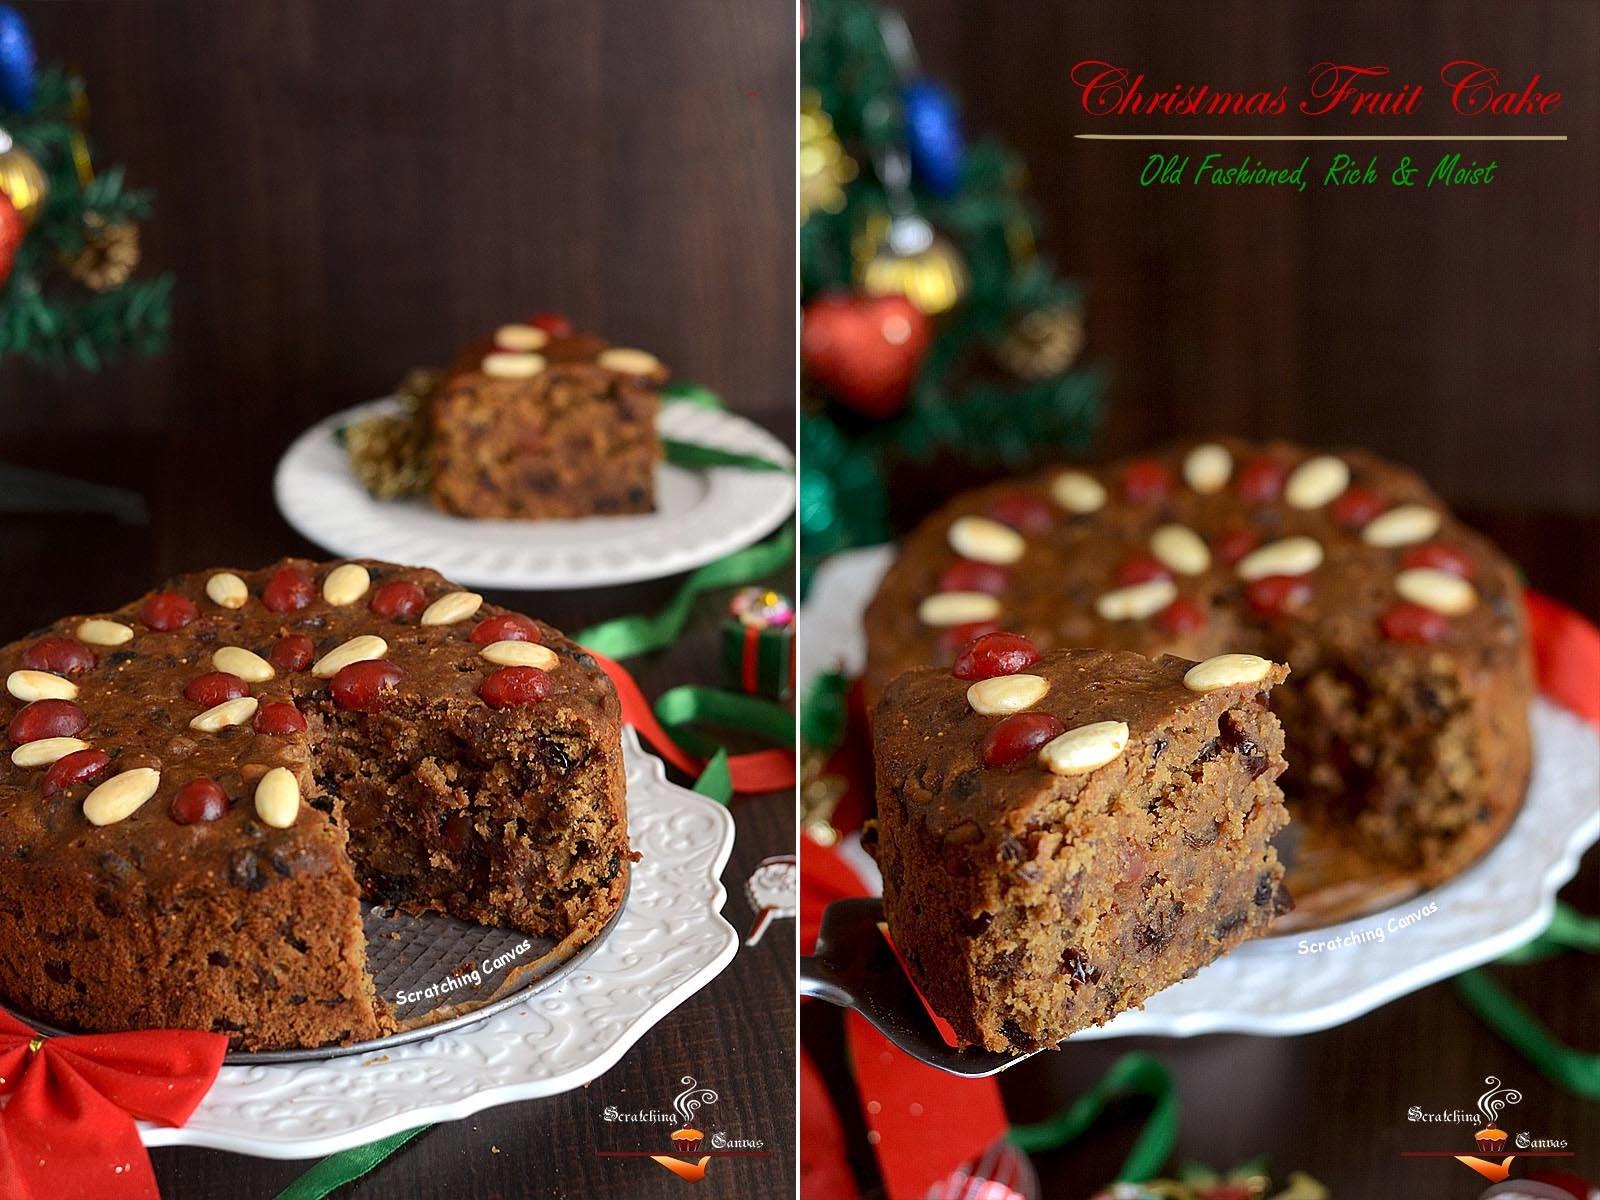 Indian style christmas cake recipe